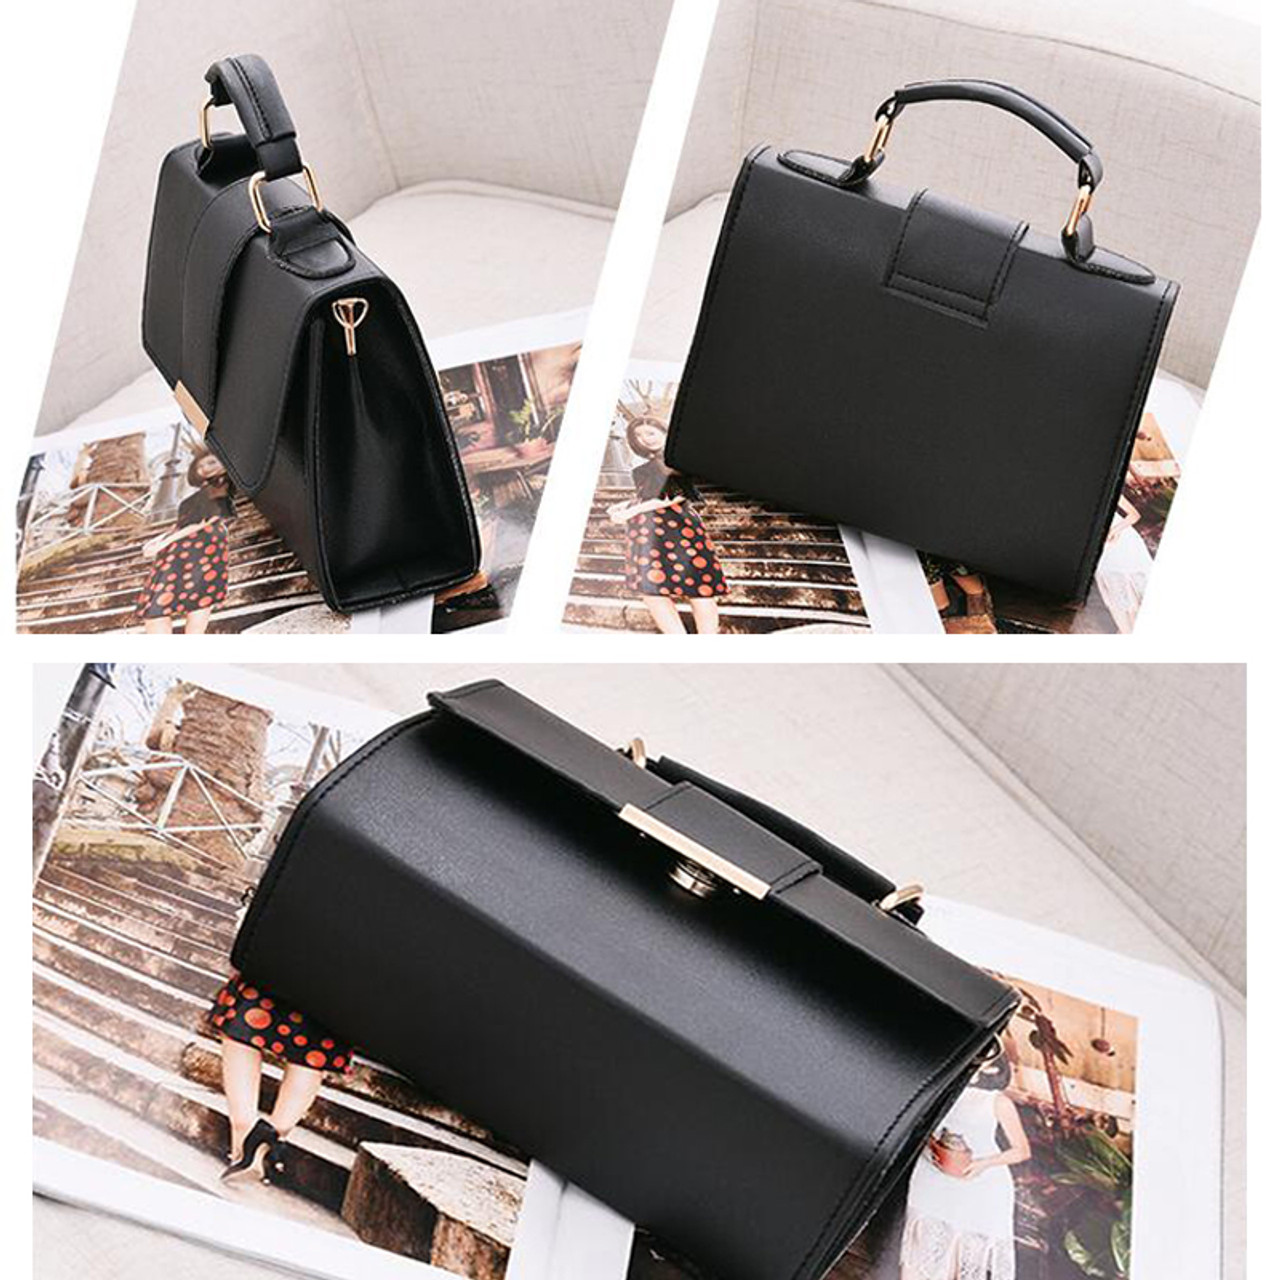 e787cd069dc91 ... REPRCLA 2018 Summer Fashion Women Bag Leather Handbags PU Shoulder Bag  Small Flap Crossbody Bags for ...